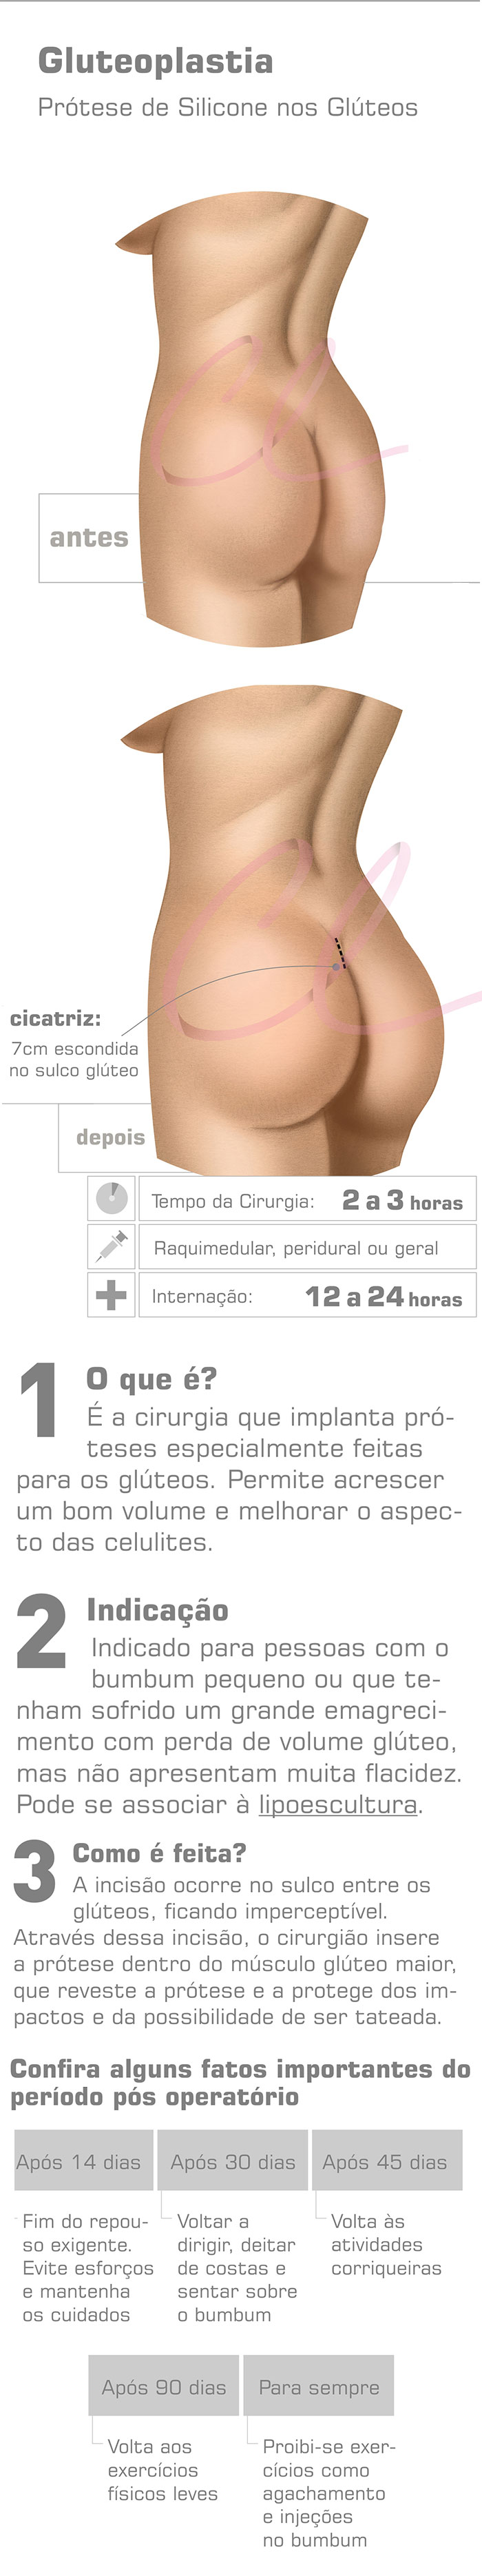 Cirurgia Plástica no Bumbum - Prótese de Glúteo